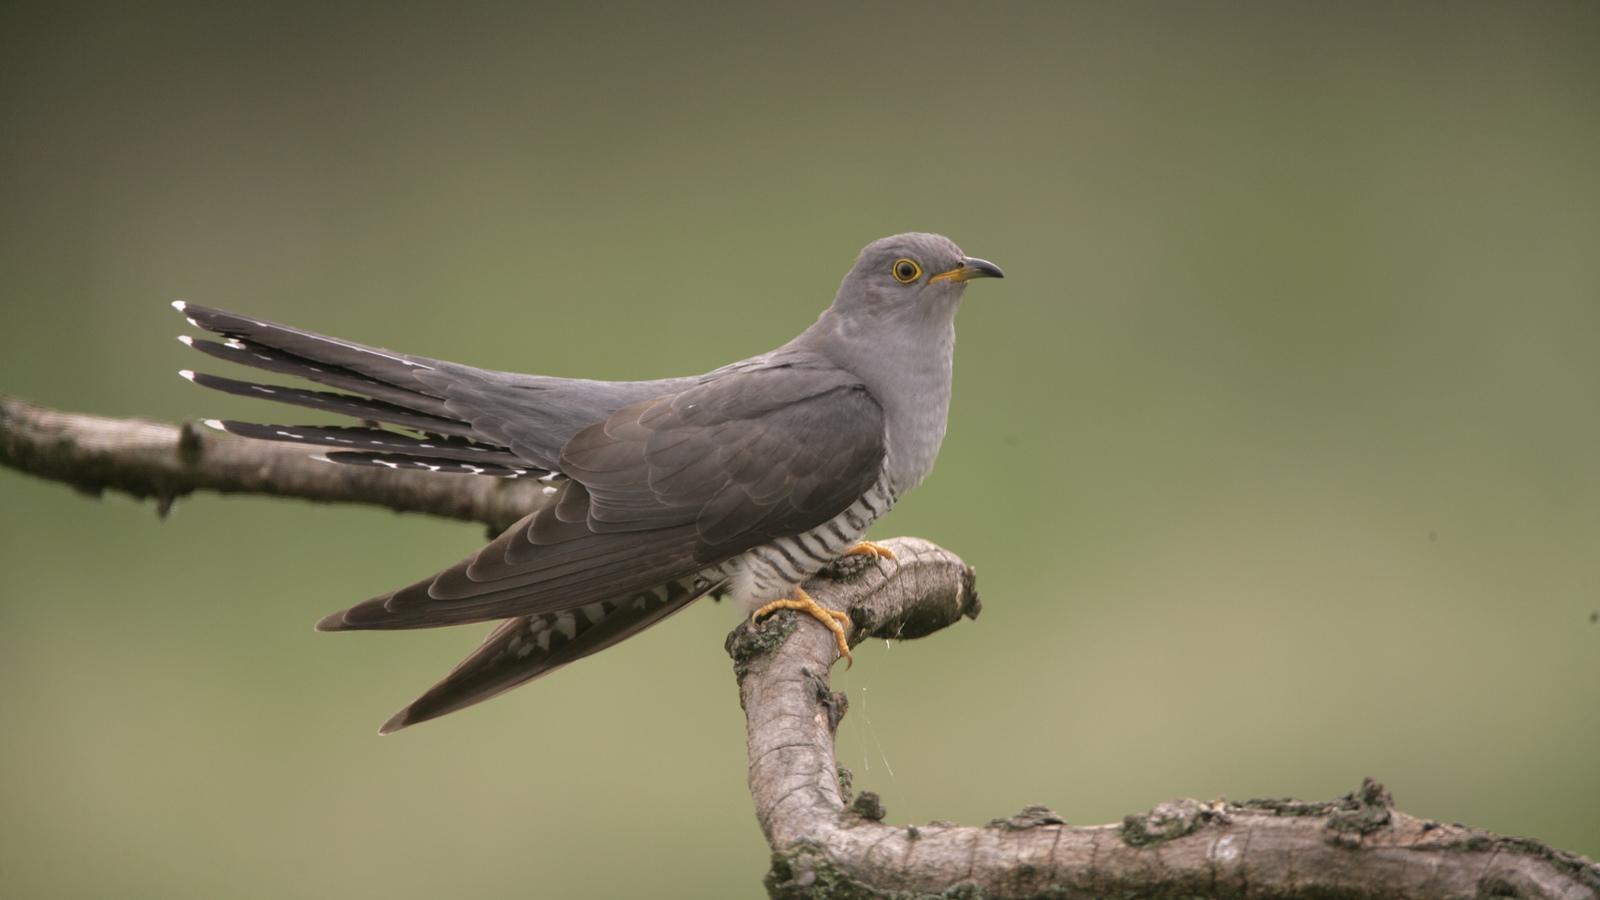 Nest of the cuckoo bird music vid 2